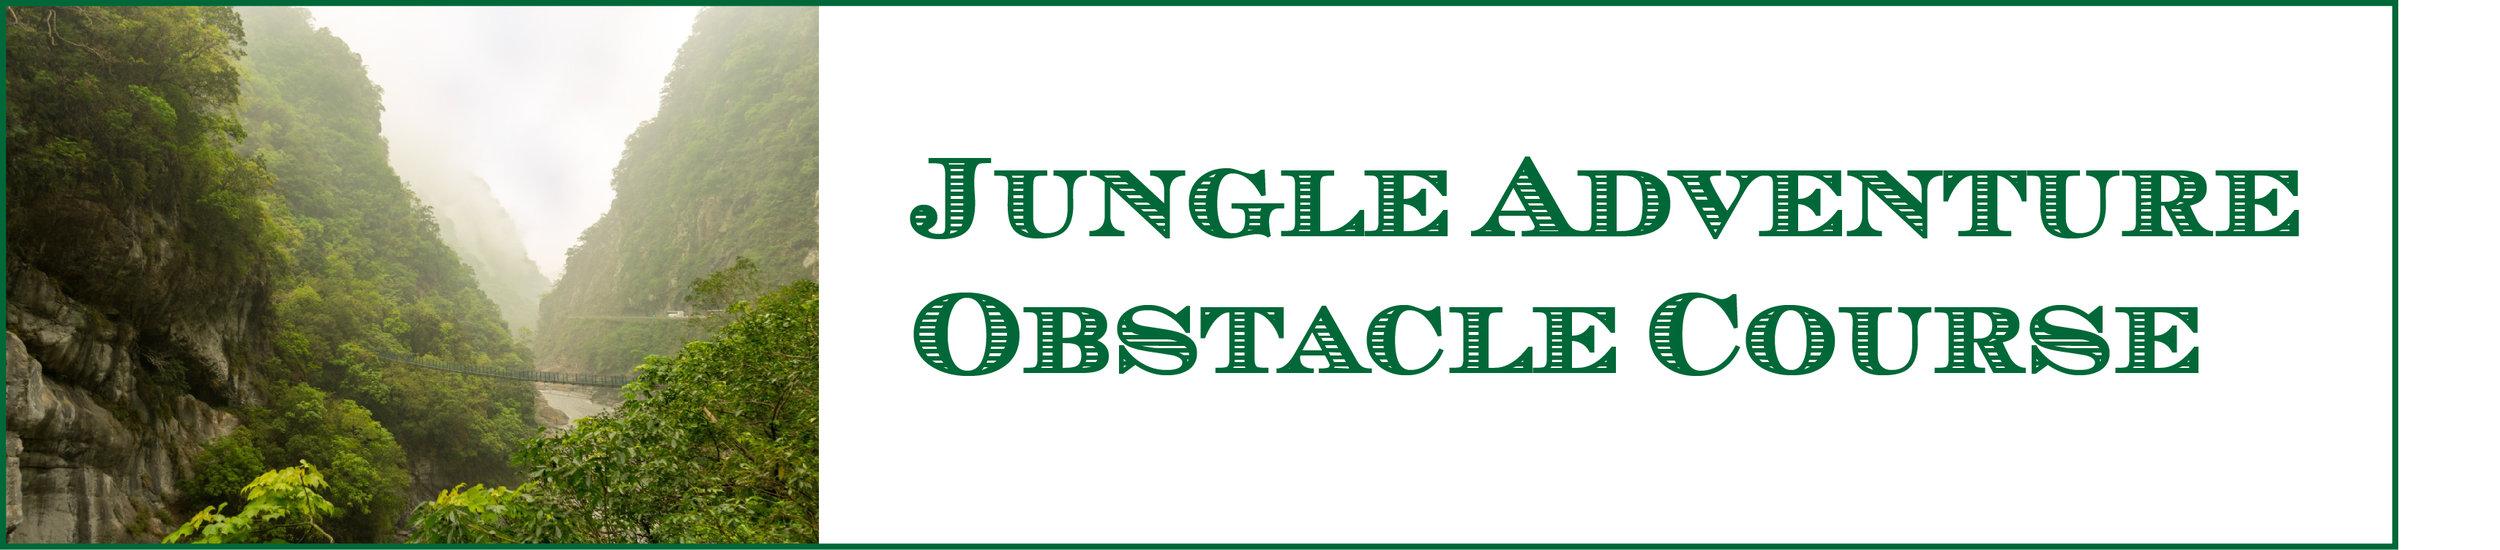 Jungle Adventure Banner.jpg